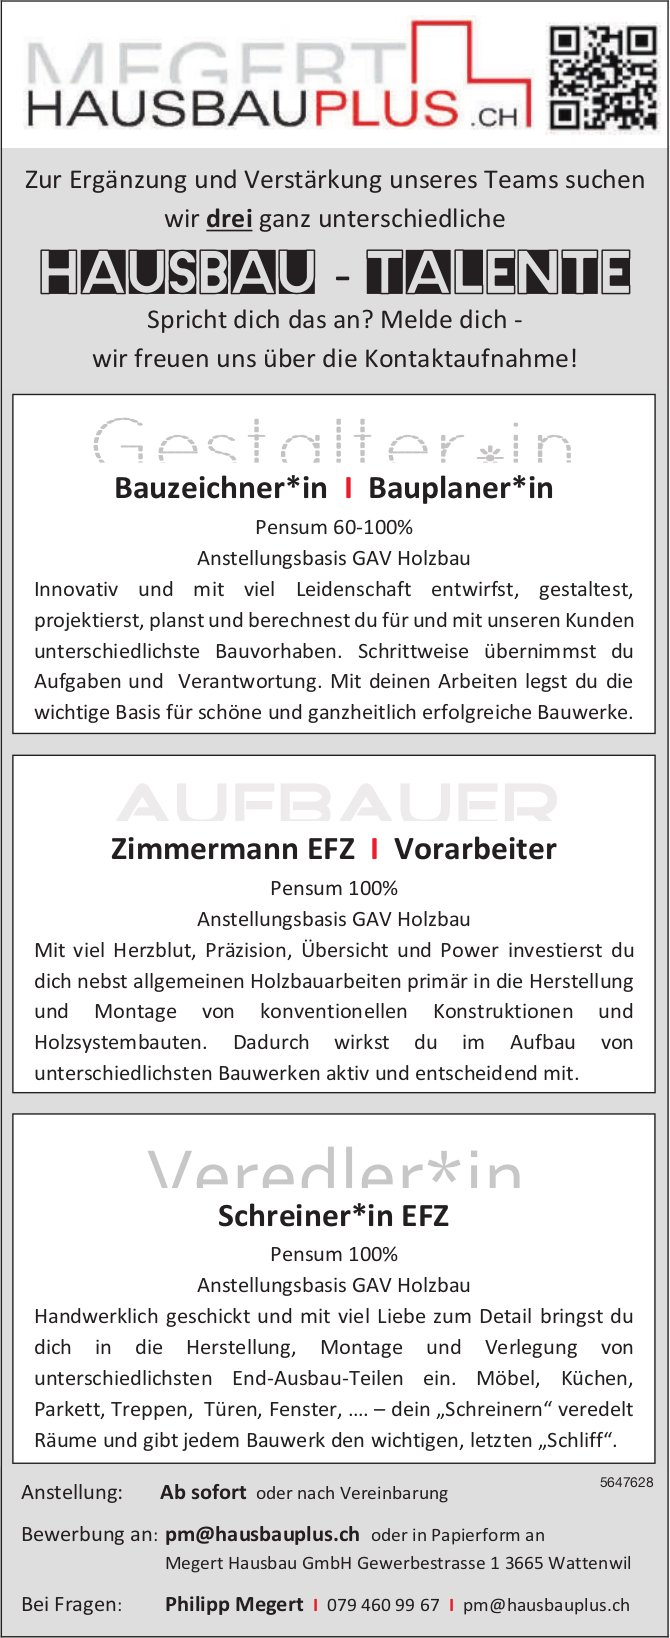 Hausbau - Talente, Megert Hausbau GmbH, Wattenwil,  gesucht